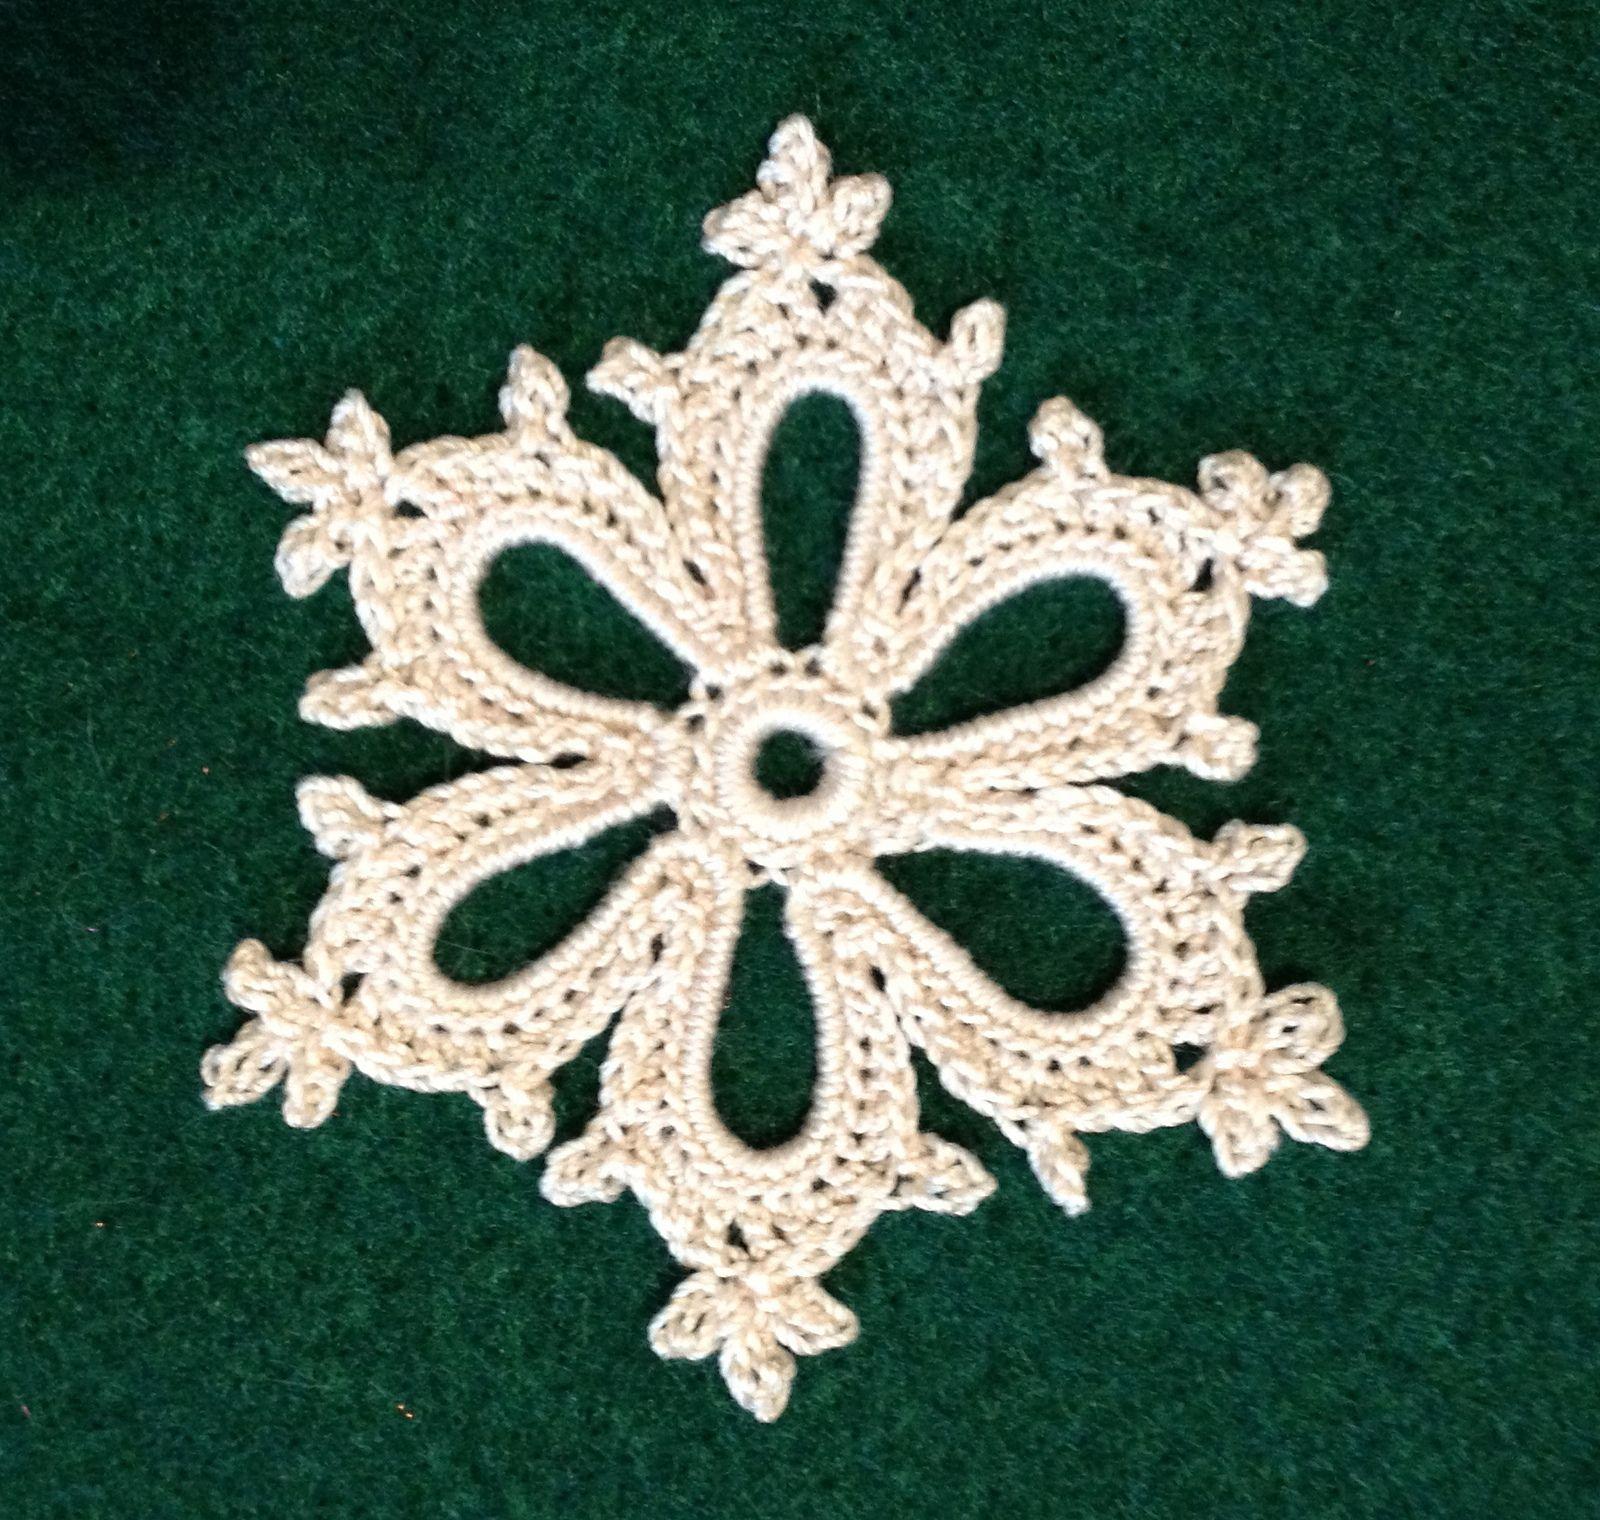 Ravelry: Irish Crochet Snowflake by Courtney Brock... Free pattern ...